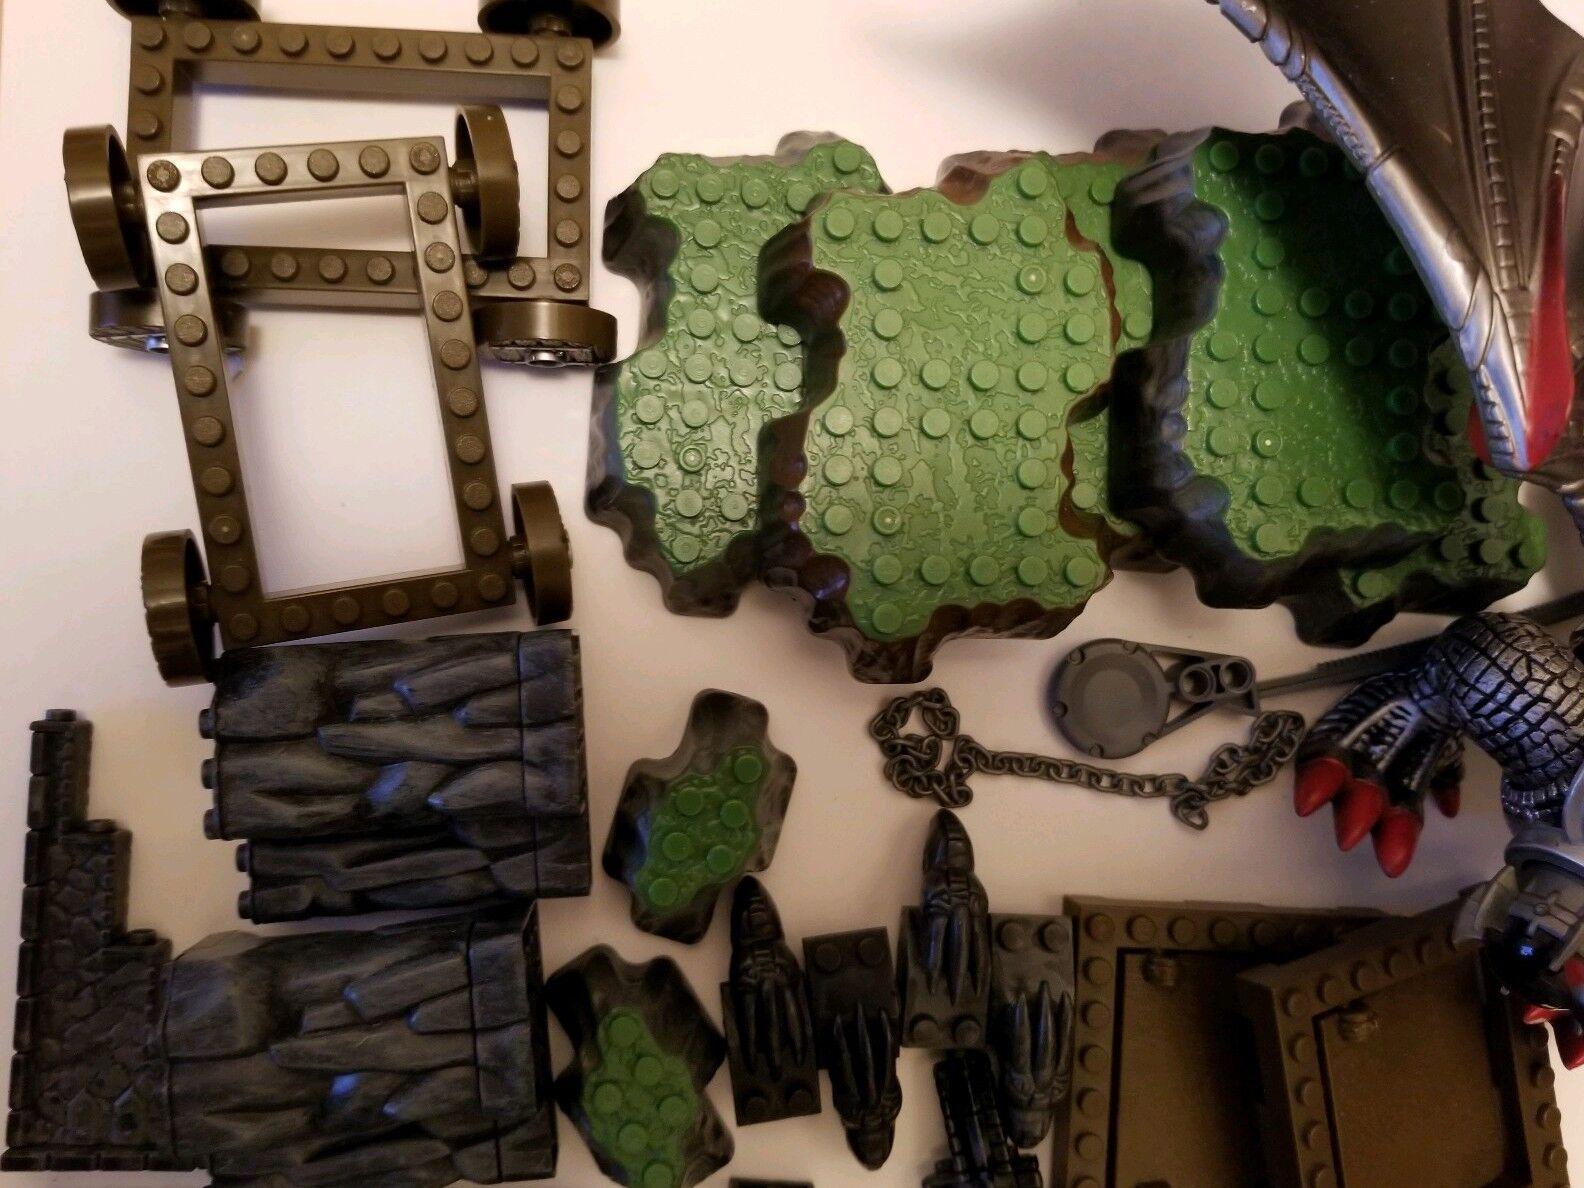 Mega Bloks Sorcerers Lair Play Set Accessories Accessories Accessories 2002 incomplete 34d4c1